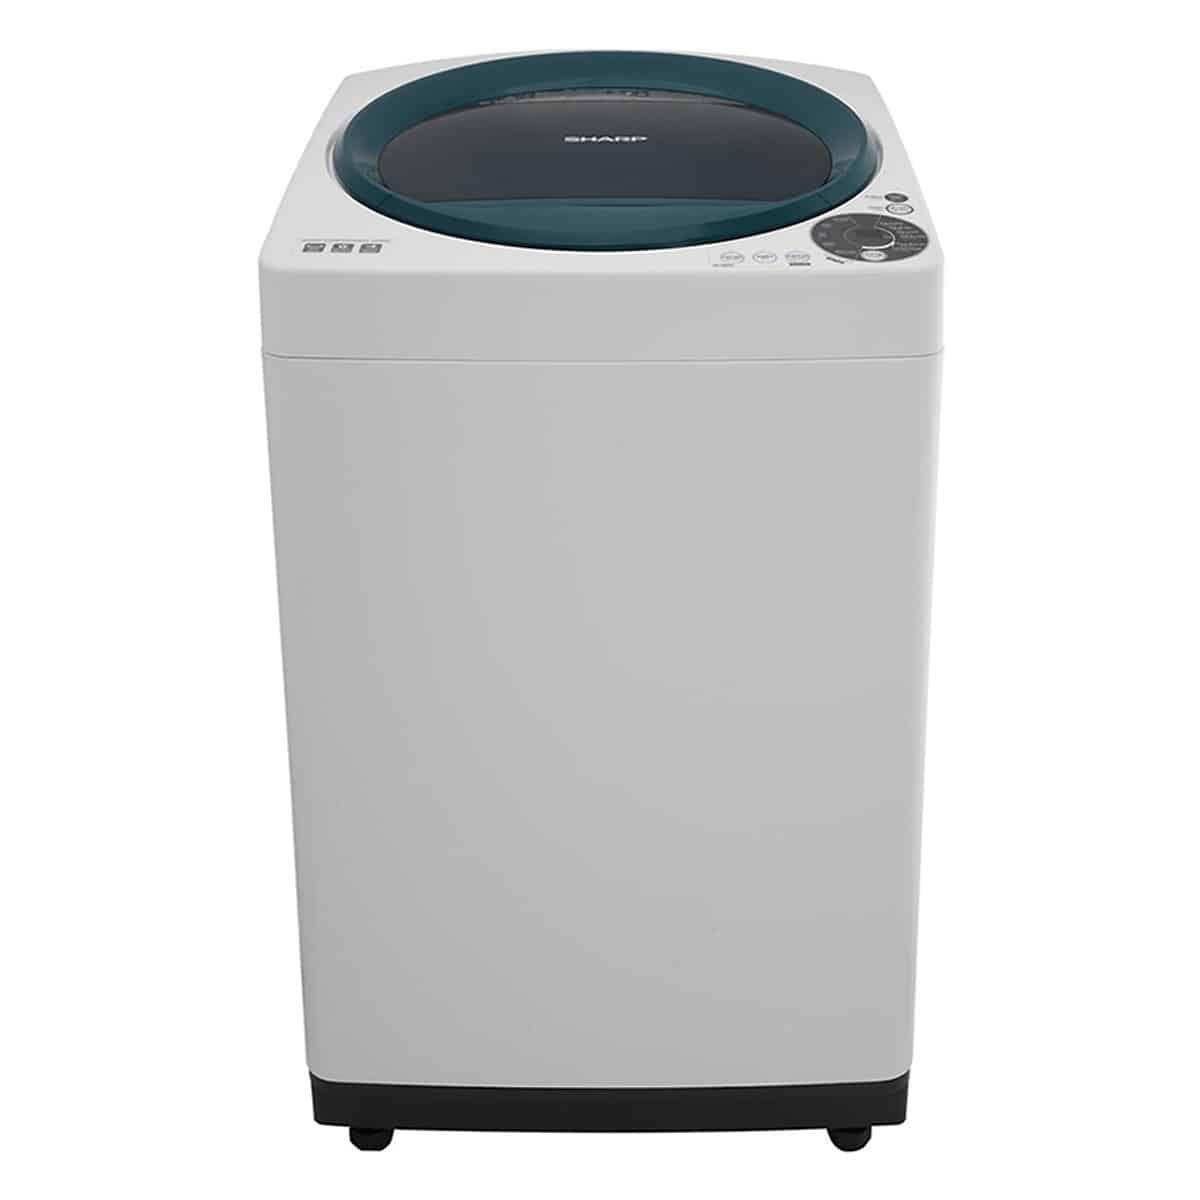 Máy giặt mini tự động